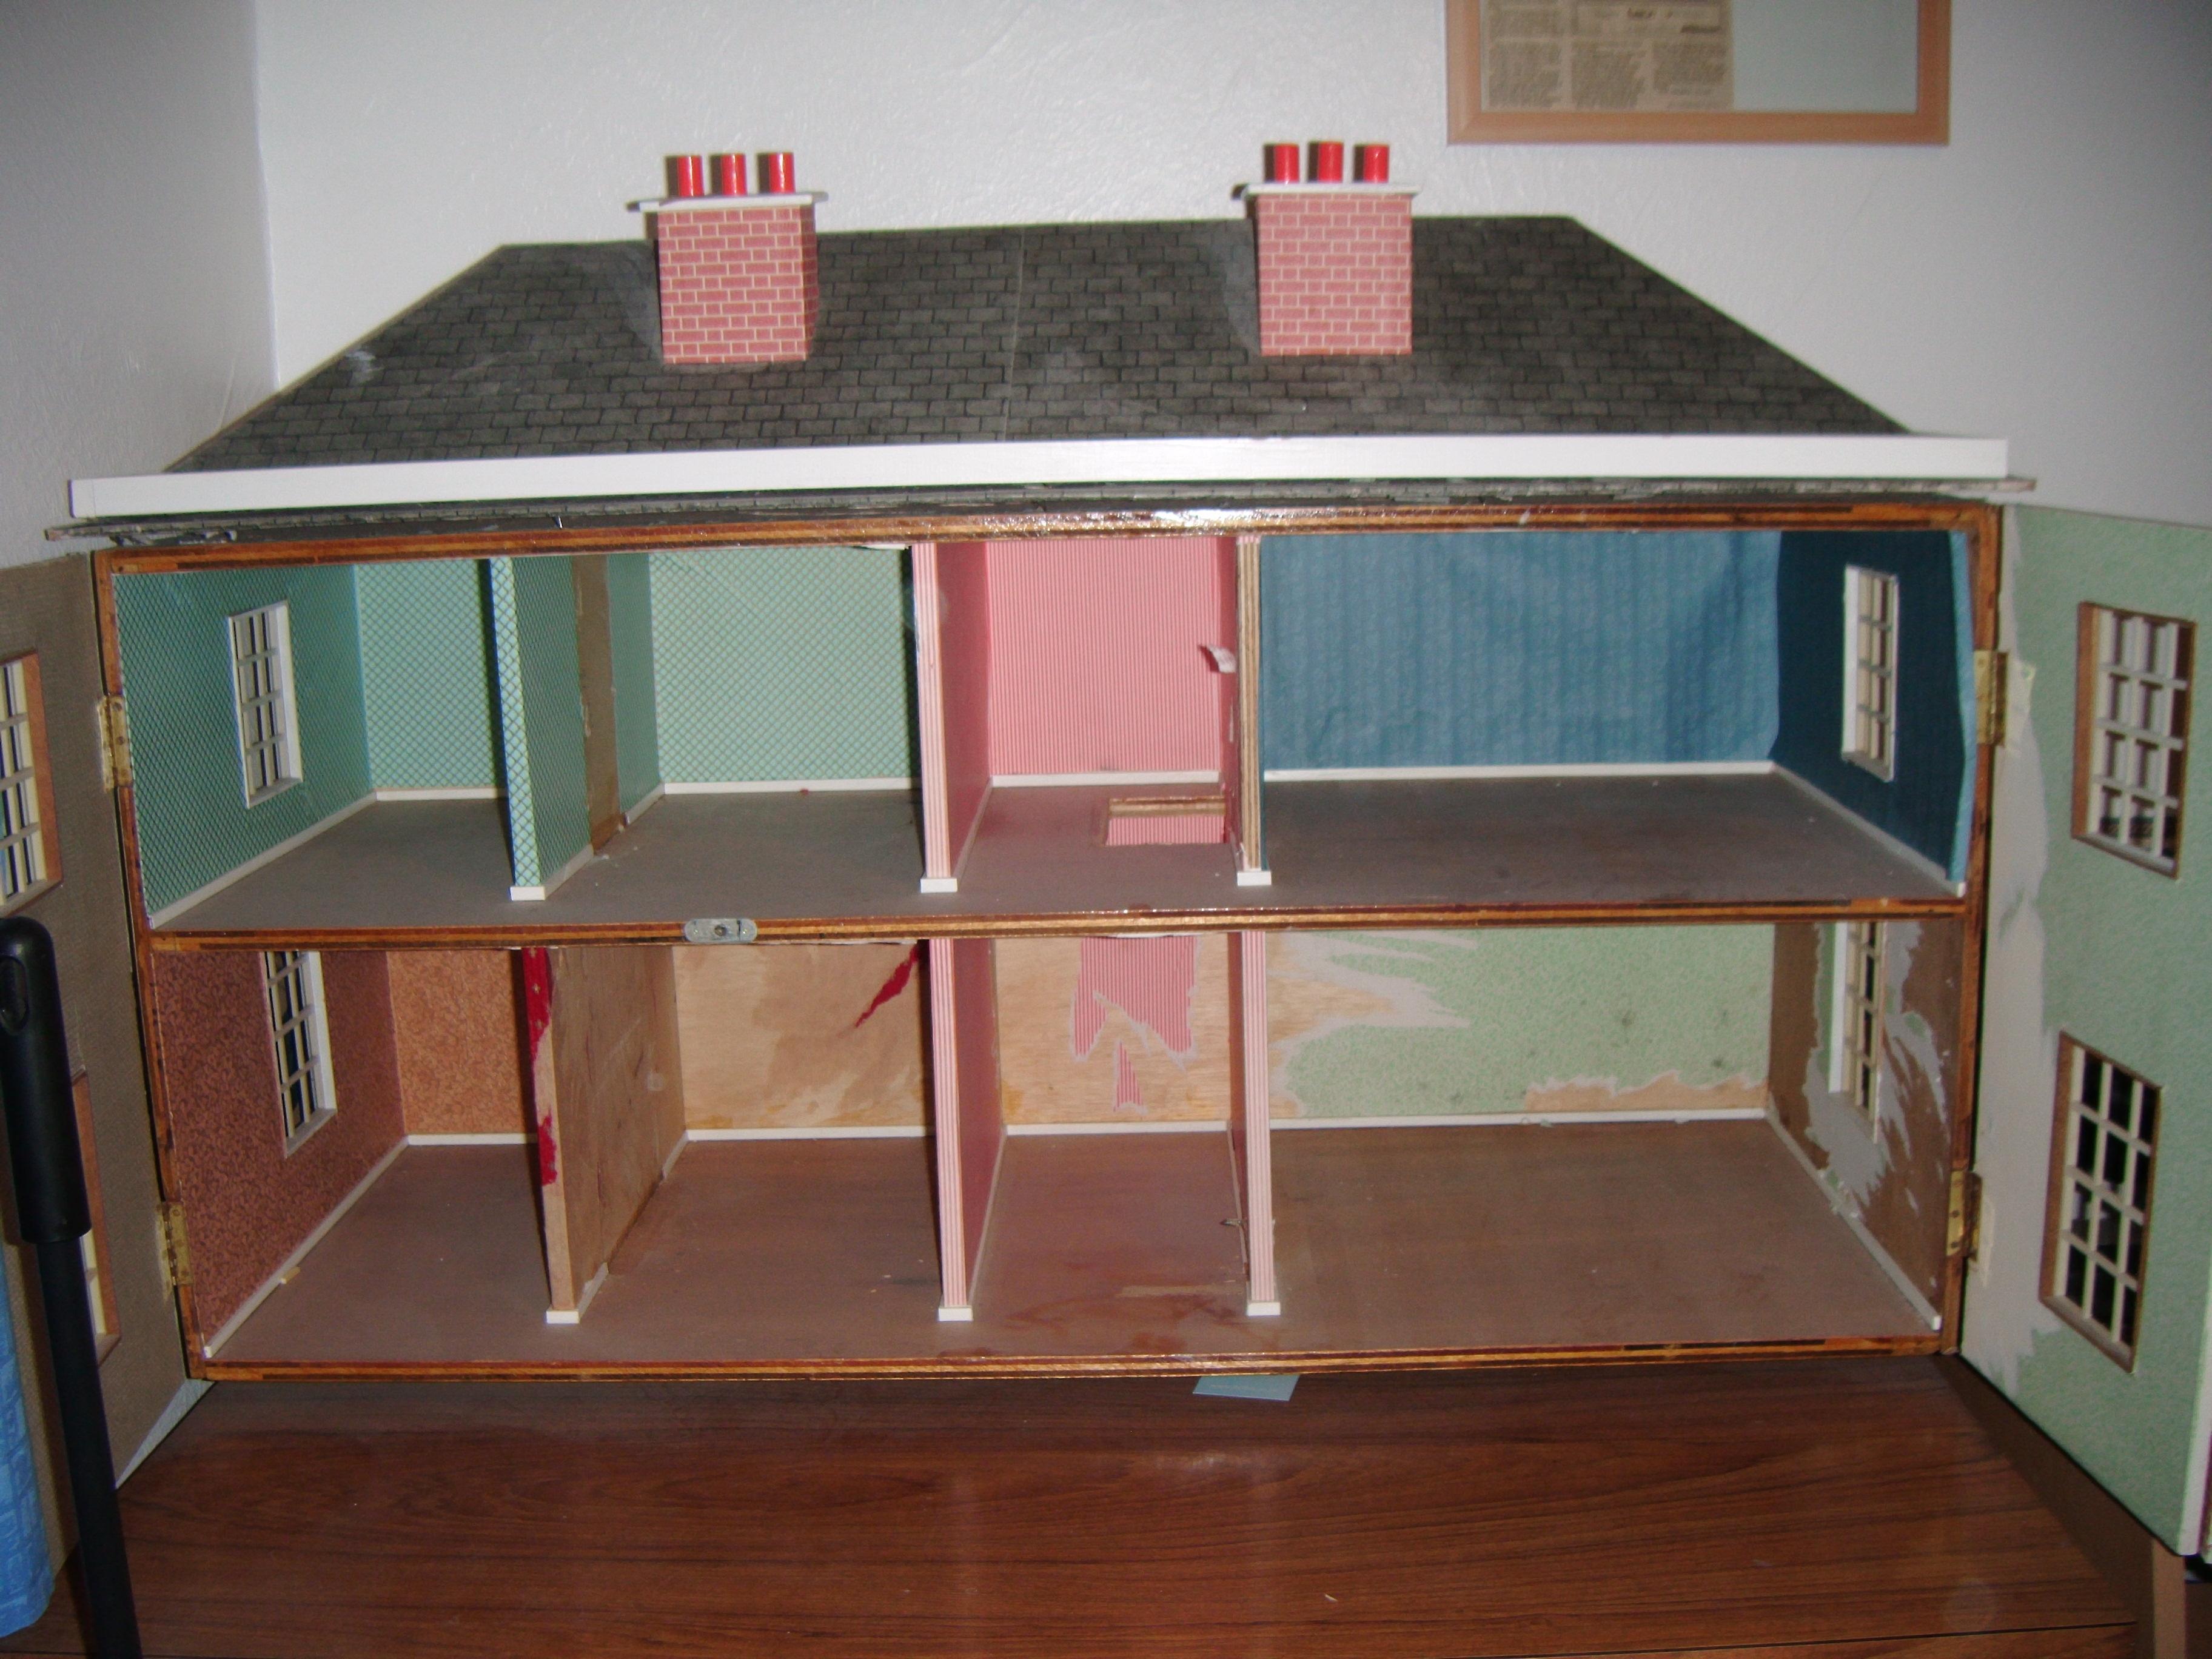 Free Pdf Dollhouse Furniture Patterns Books Plans Diy How